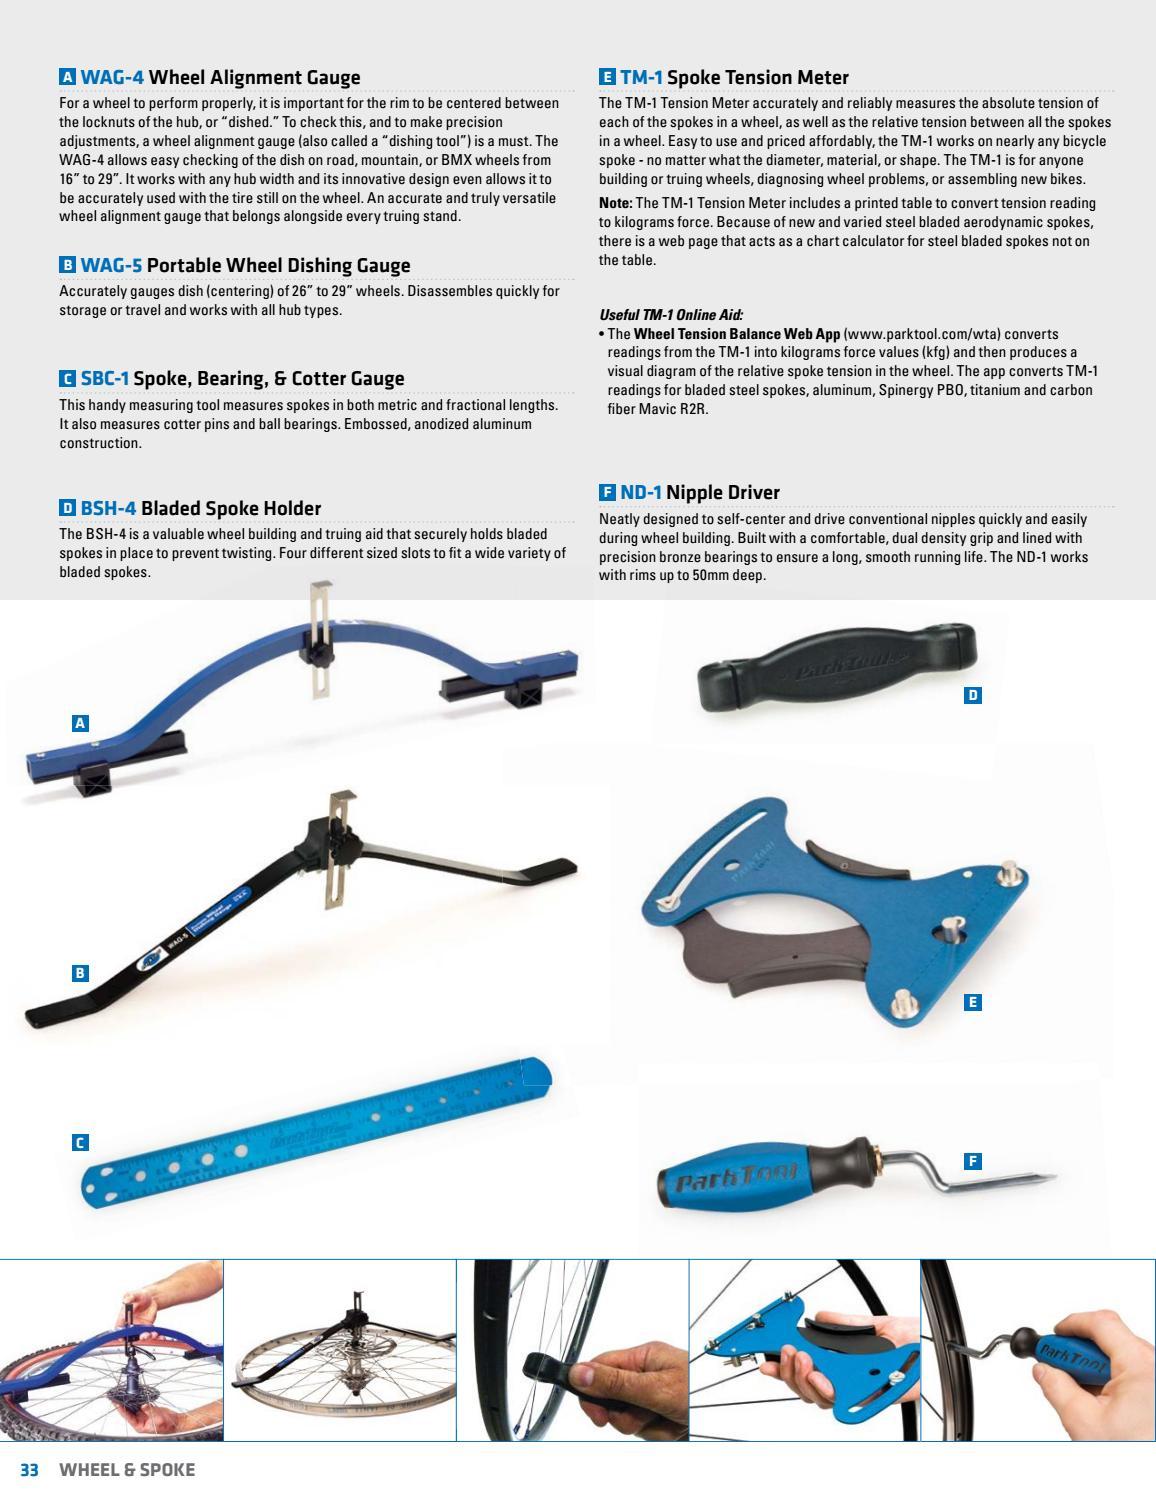 Park Tool WAG-5 Portable Wheel Dishing Gauge